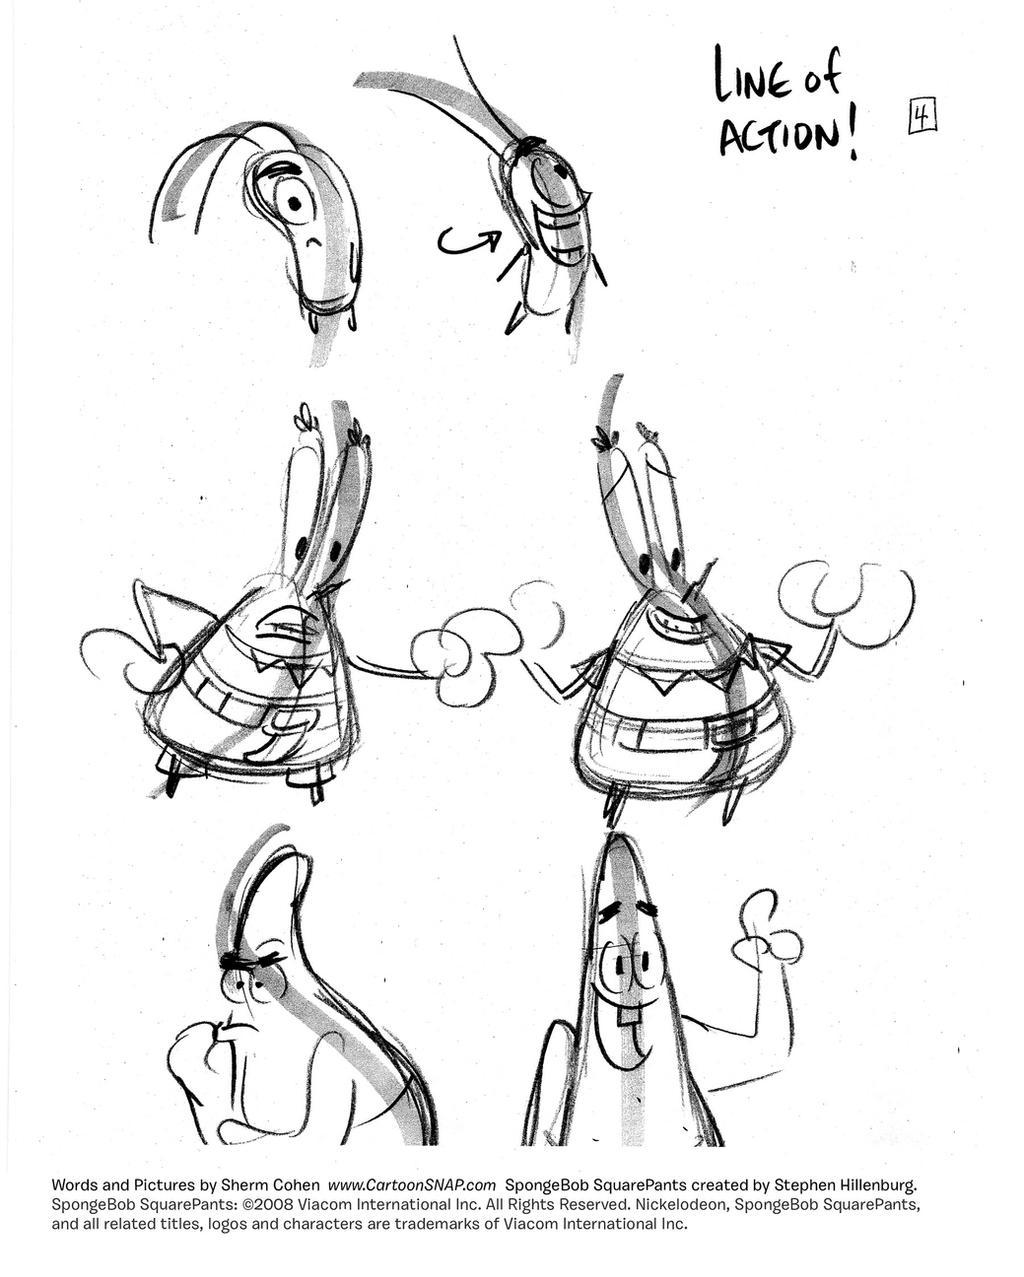 LINEA DE ACCIÓN: SpongeBob_Tutorial_4_Action_by_shermcohen